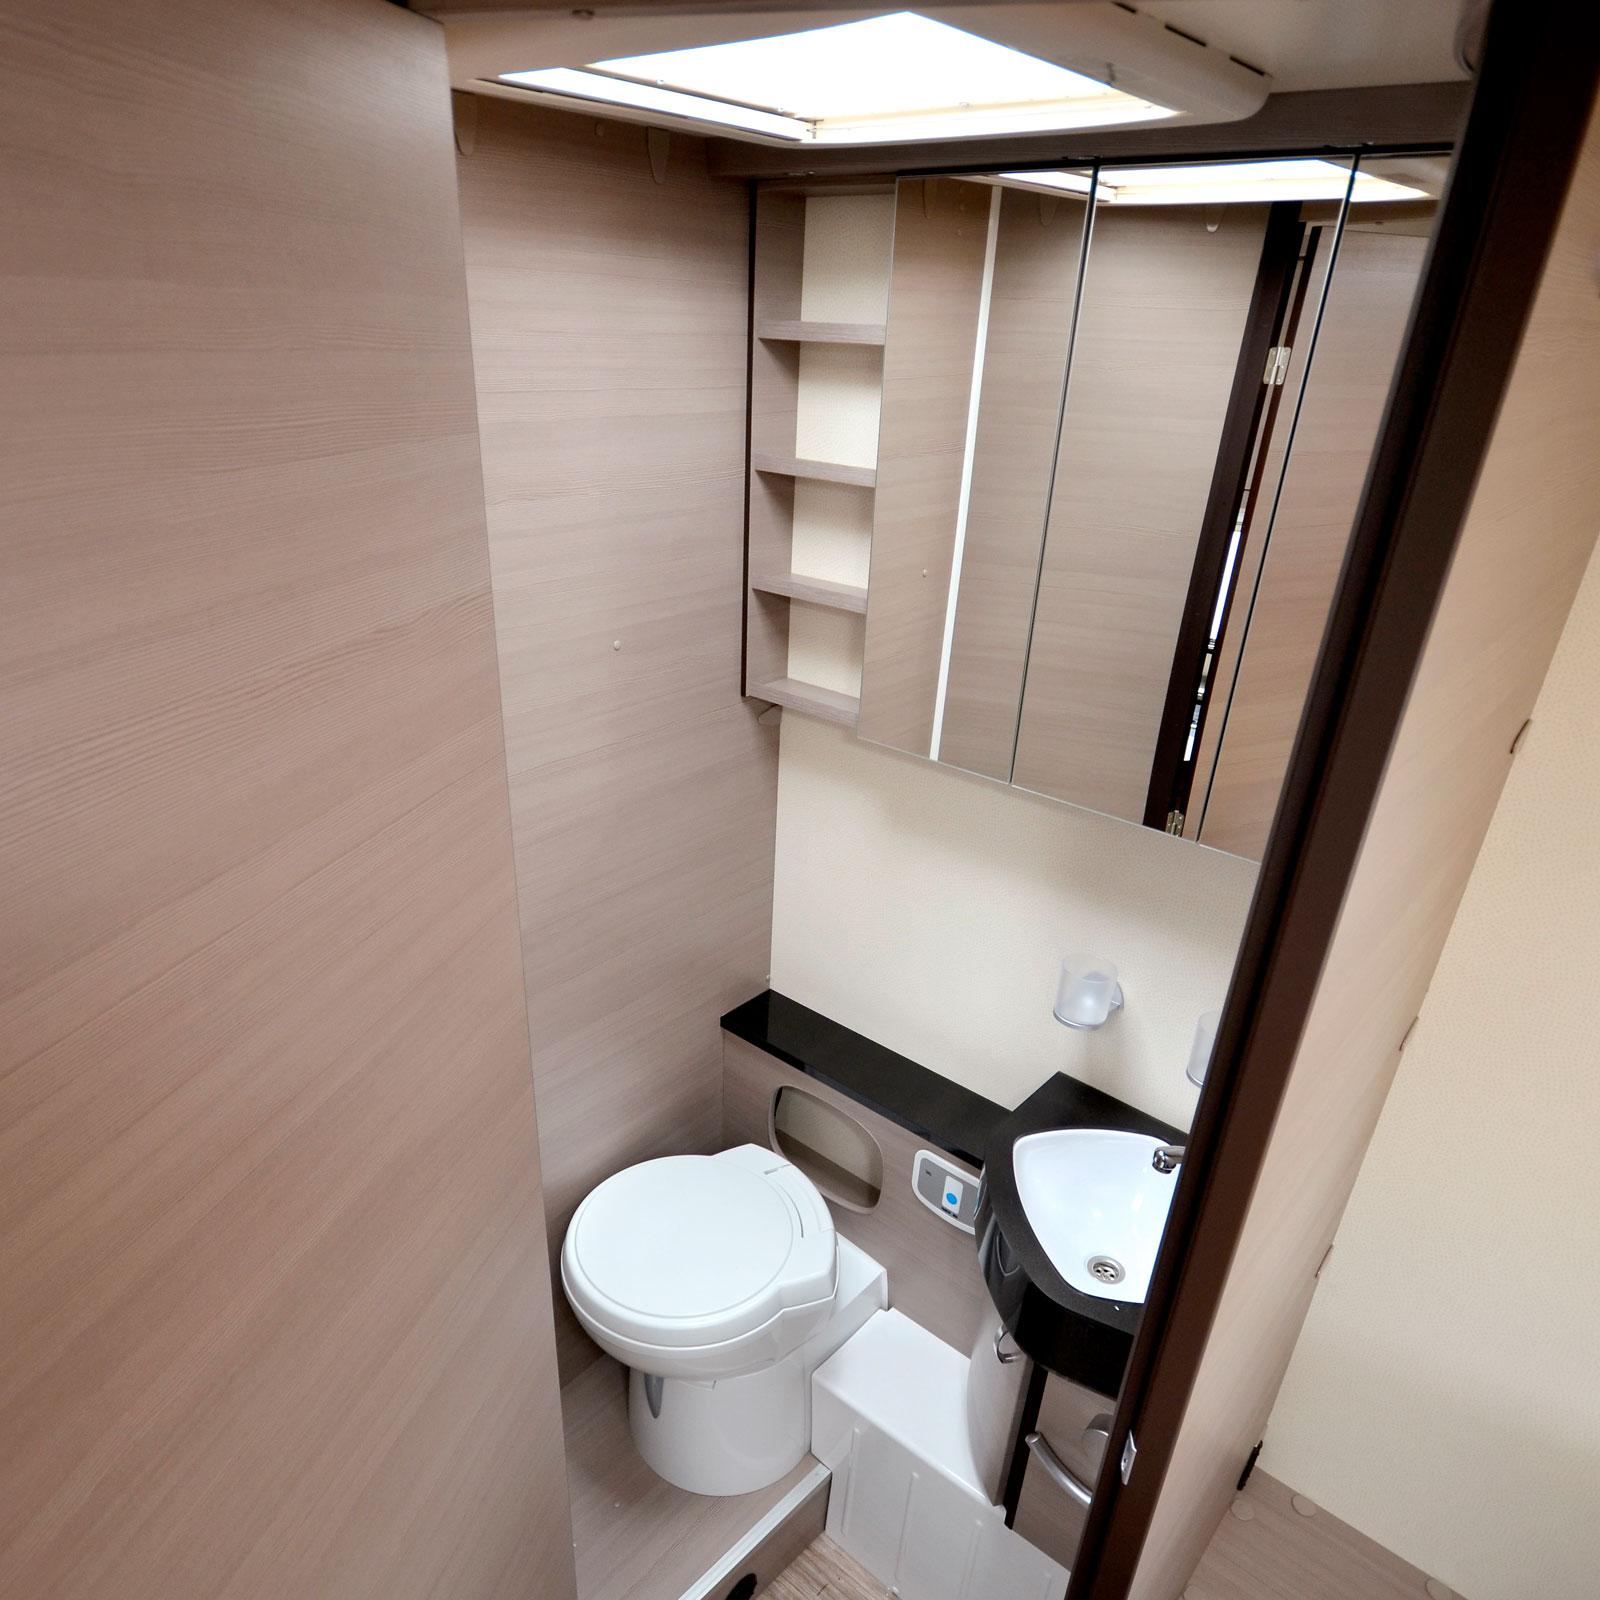 WC. Toadörren skiljer av mot sovrummet i öppet läge.